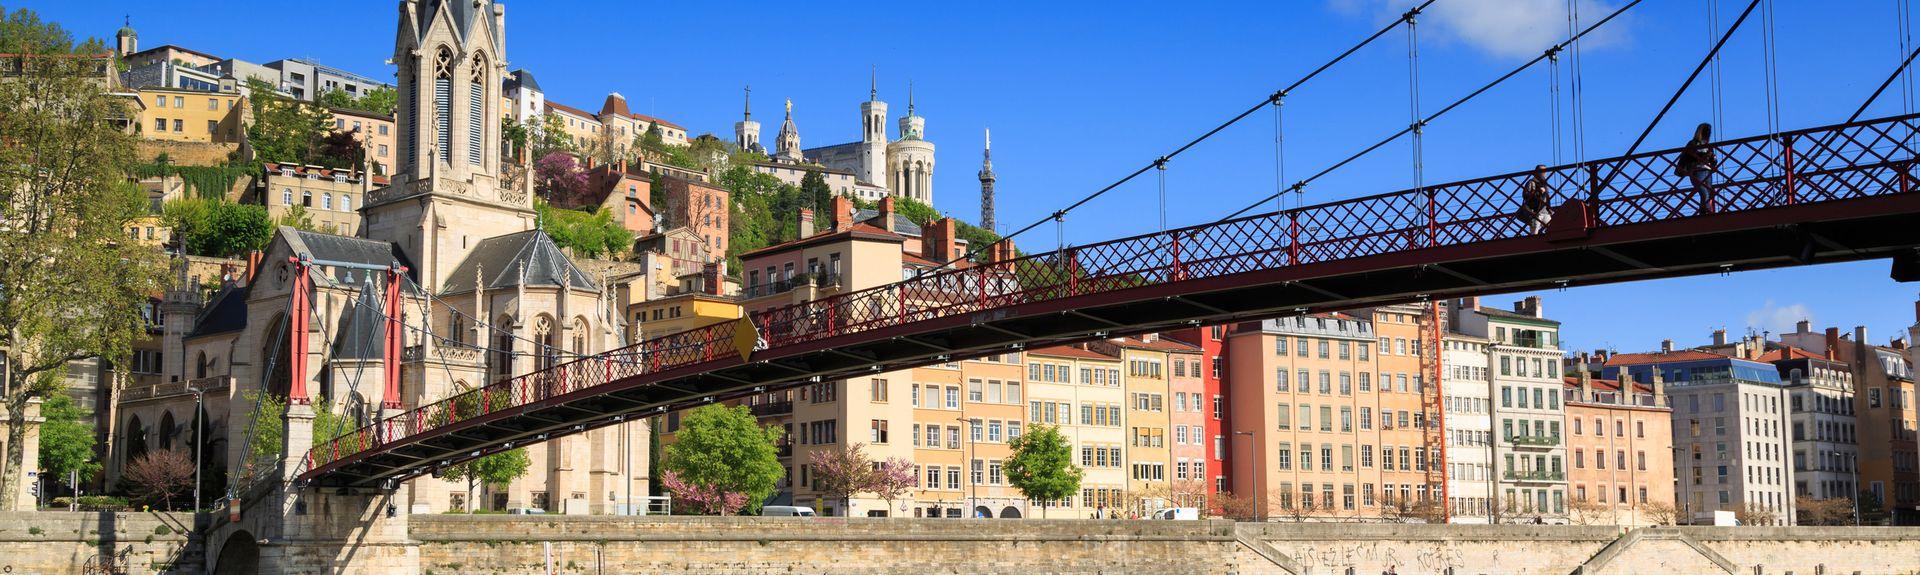 Lyon, Auvergne-Rhône-Alpes, Ranska